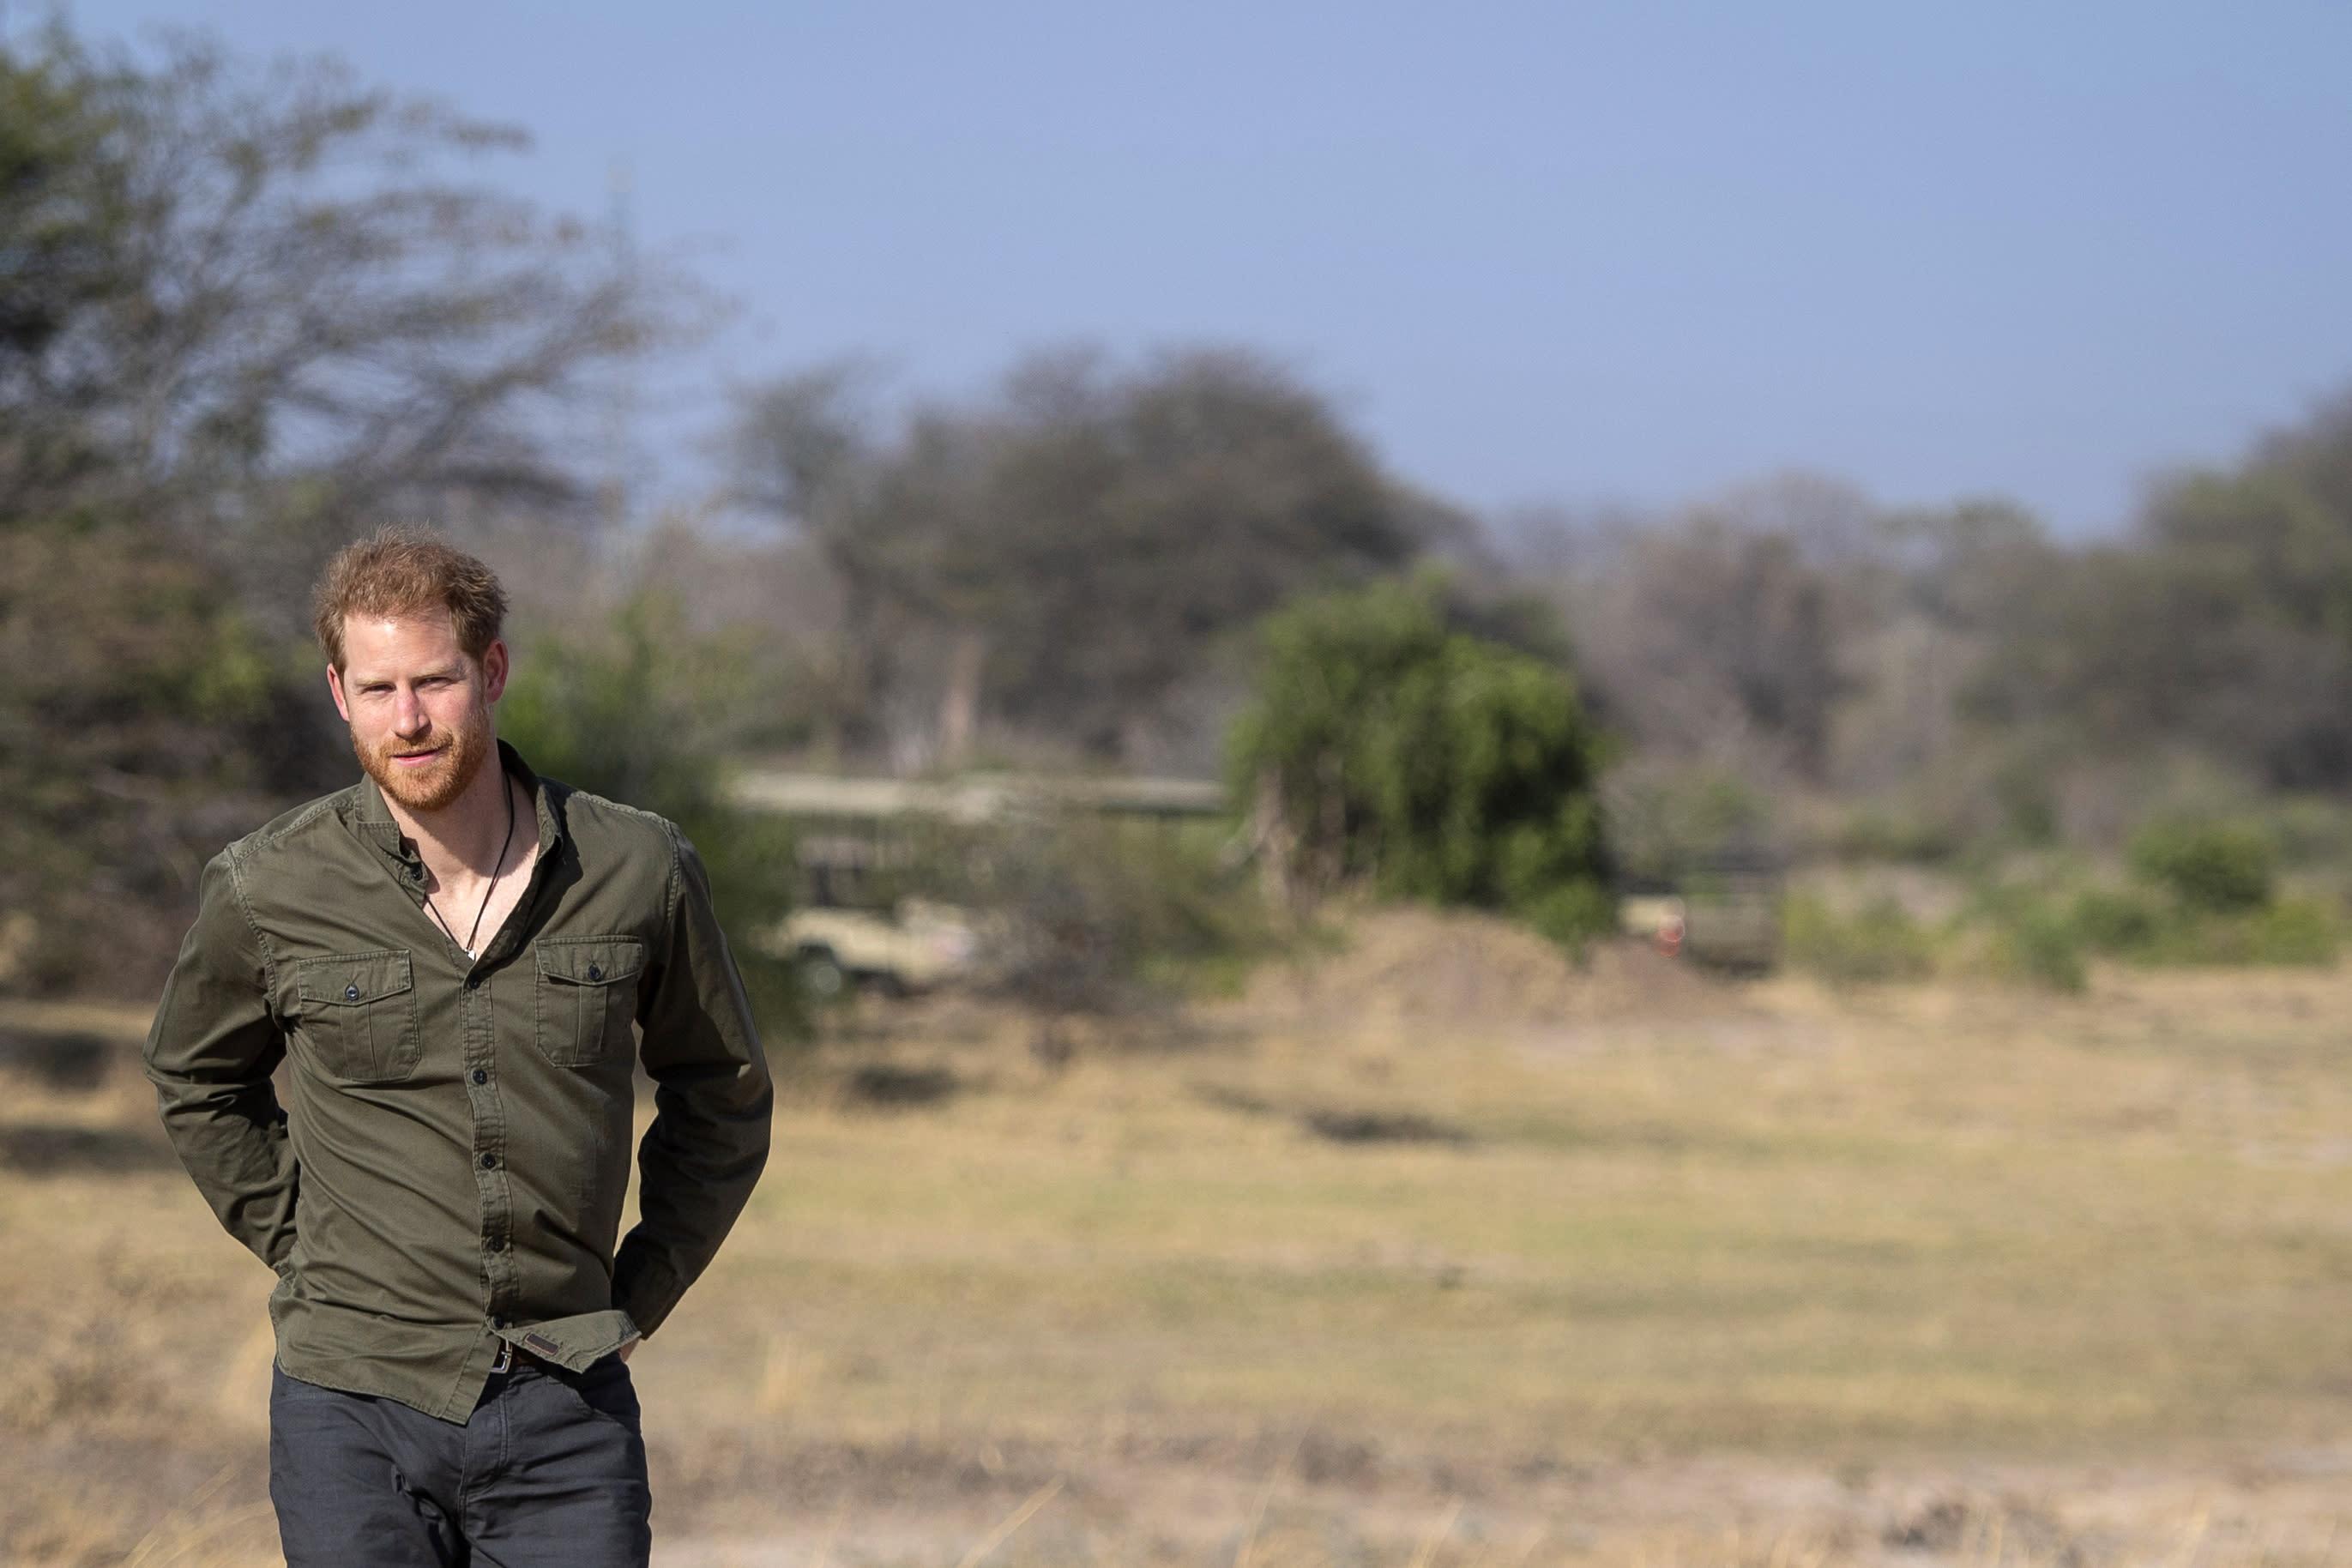 Prince Harry Recreates Princess Diana's Walk Through Minefield in Angola